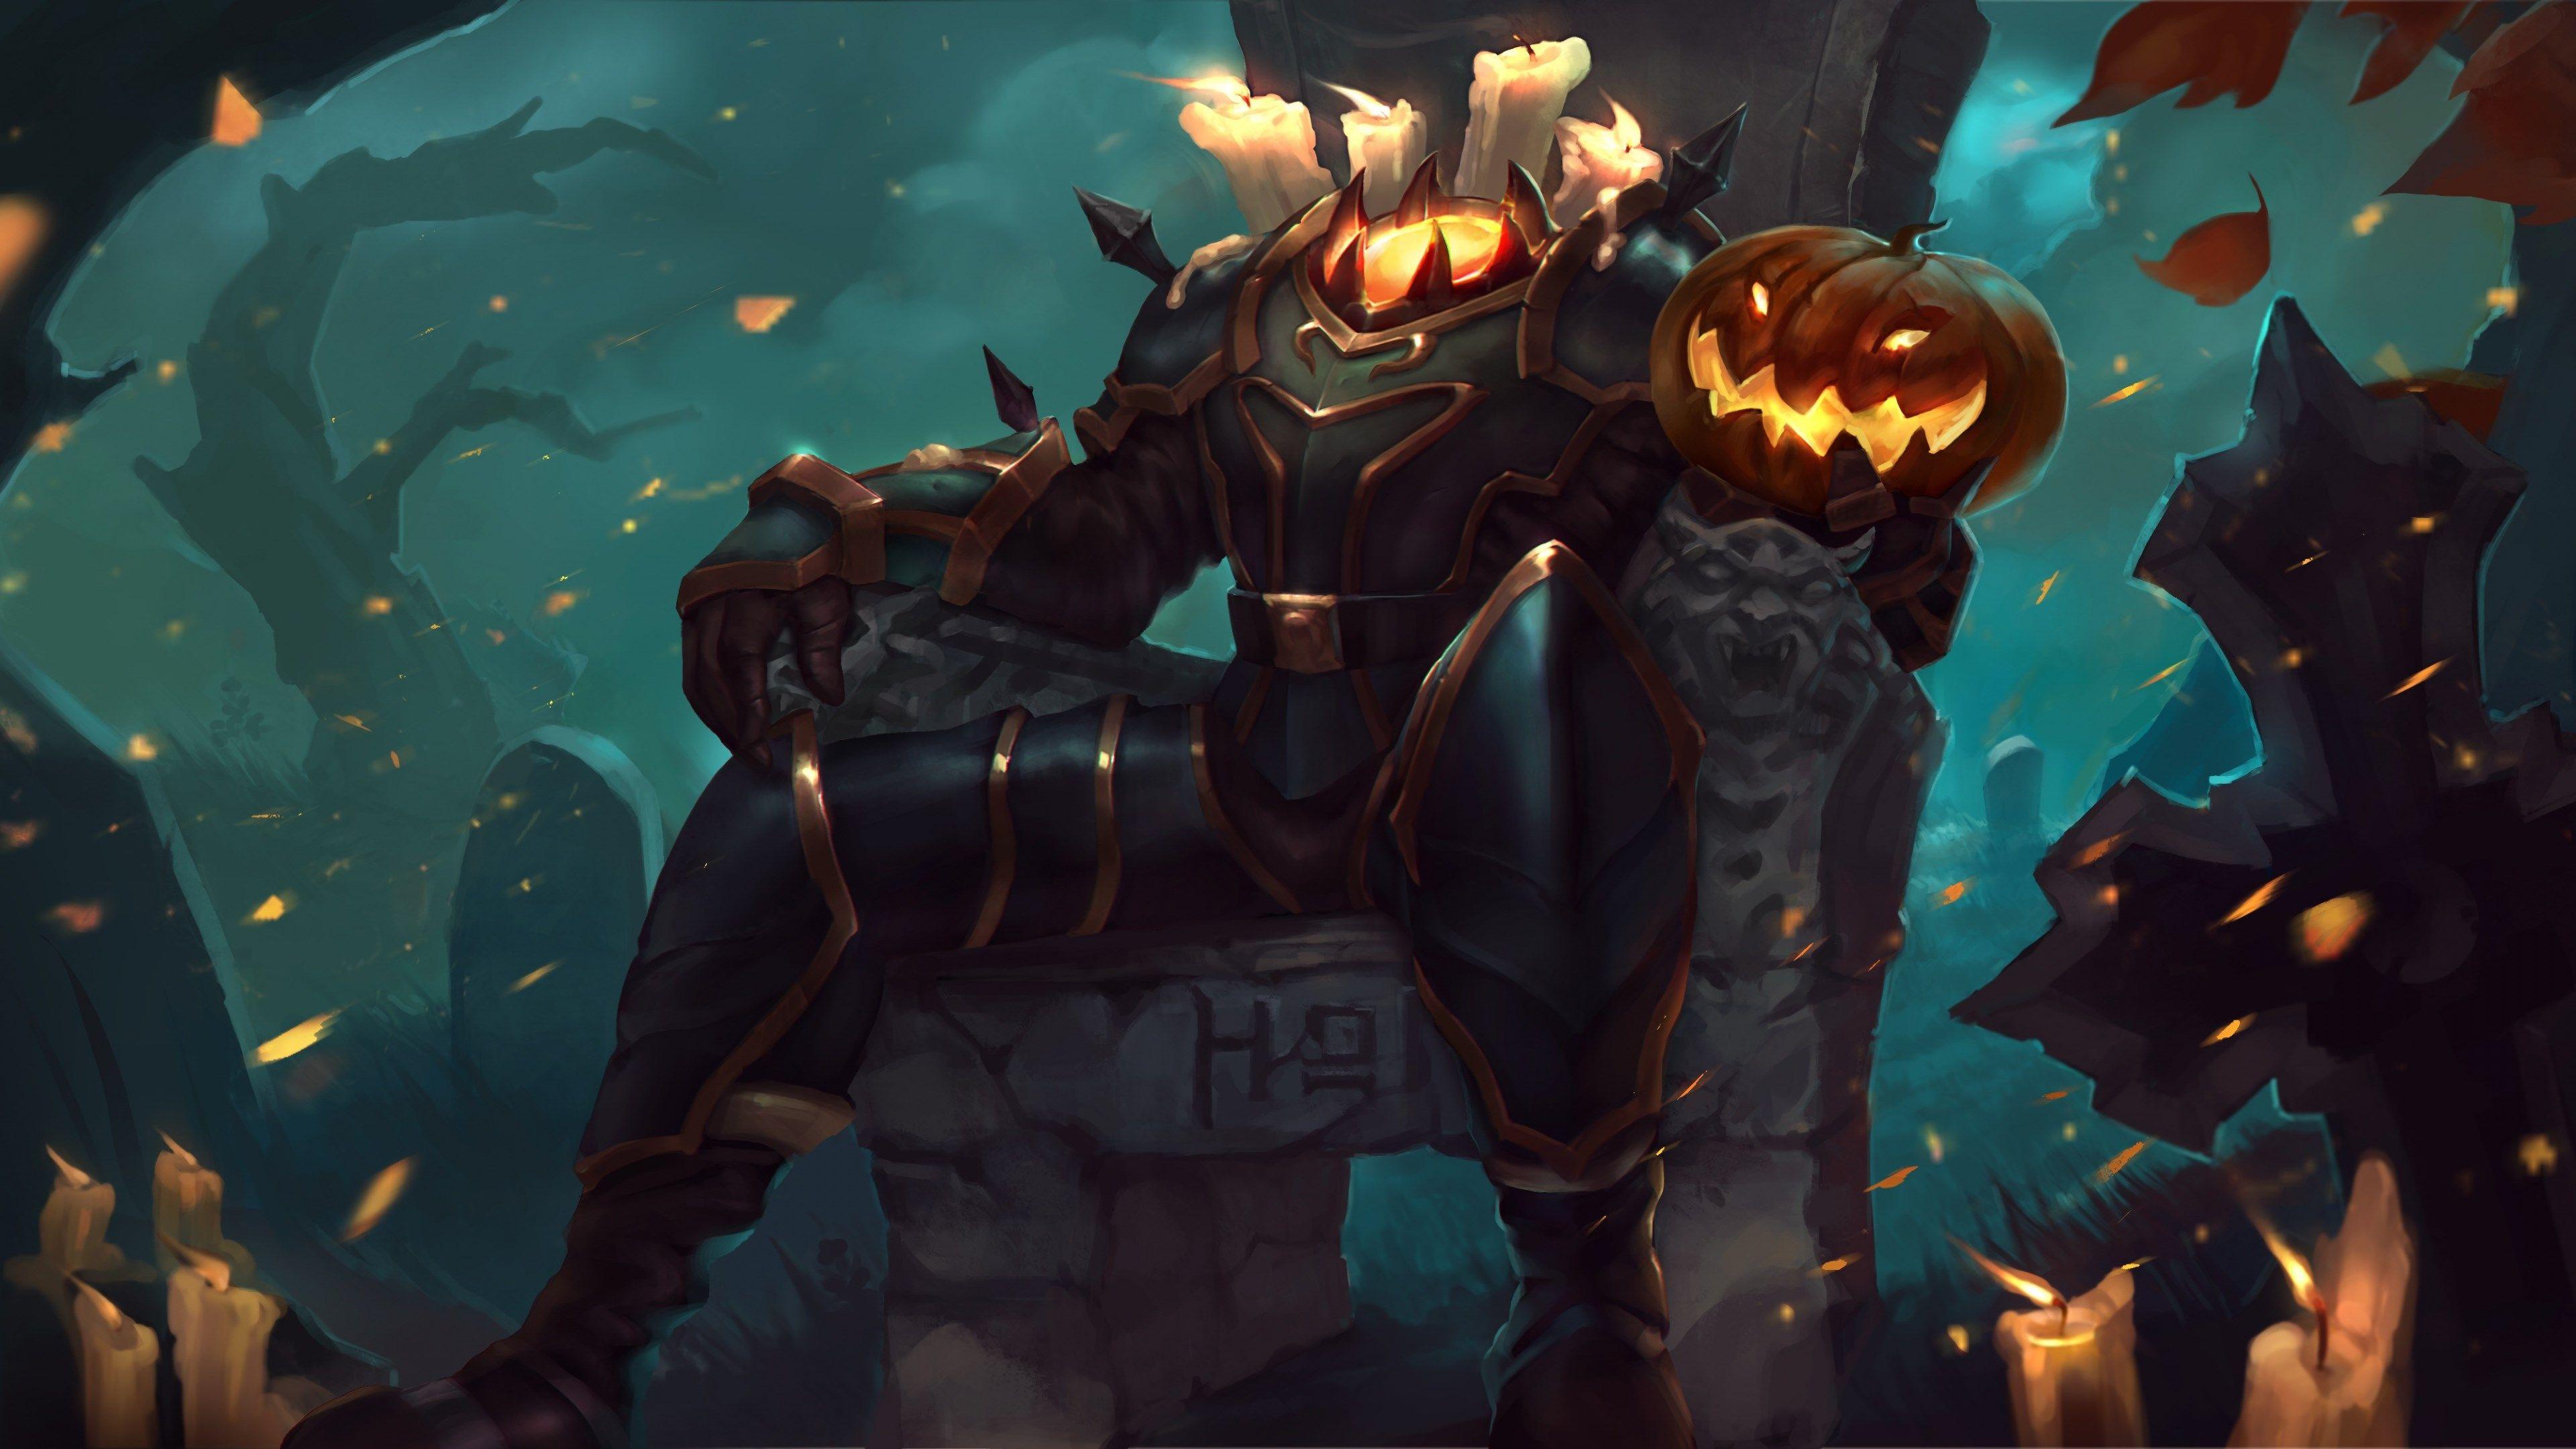 4k beautiful wallpaper hd (3840x2160) Halloween